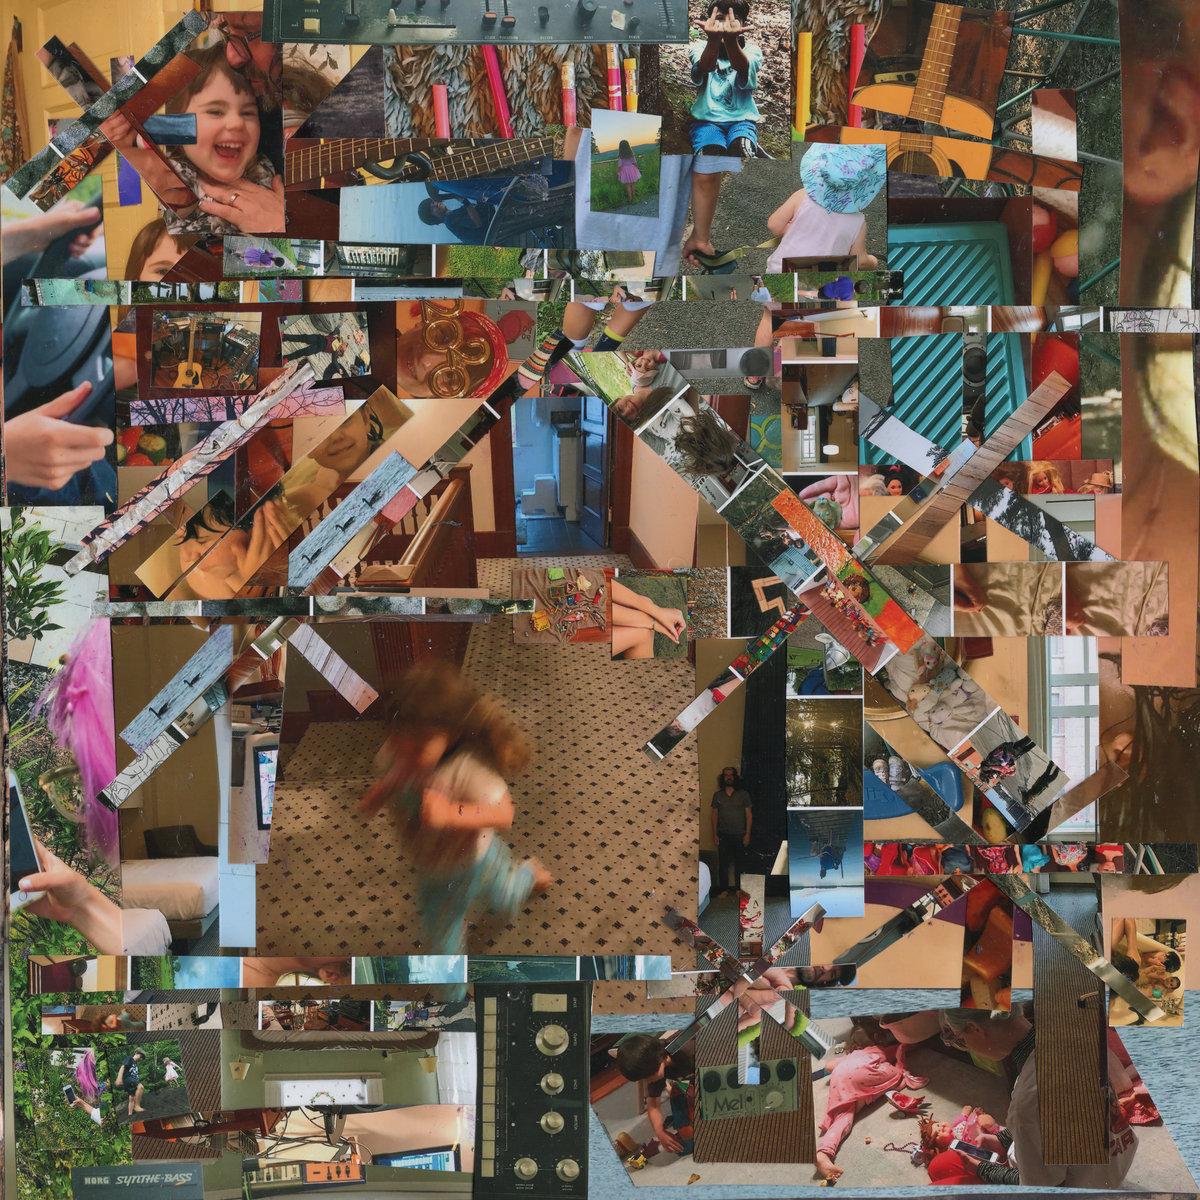 Lou Barlow - Reason to Live [LTD LP] (Light blue vinyl)